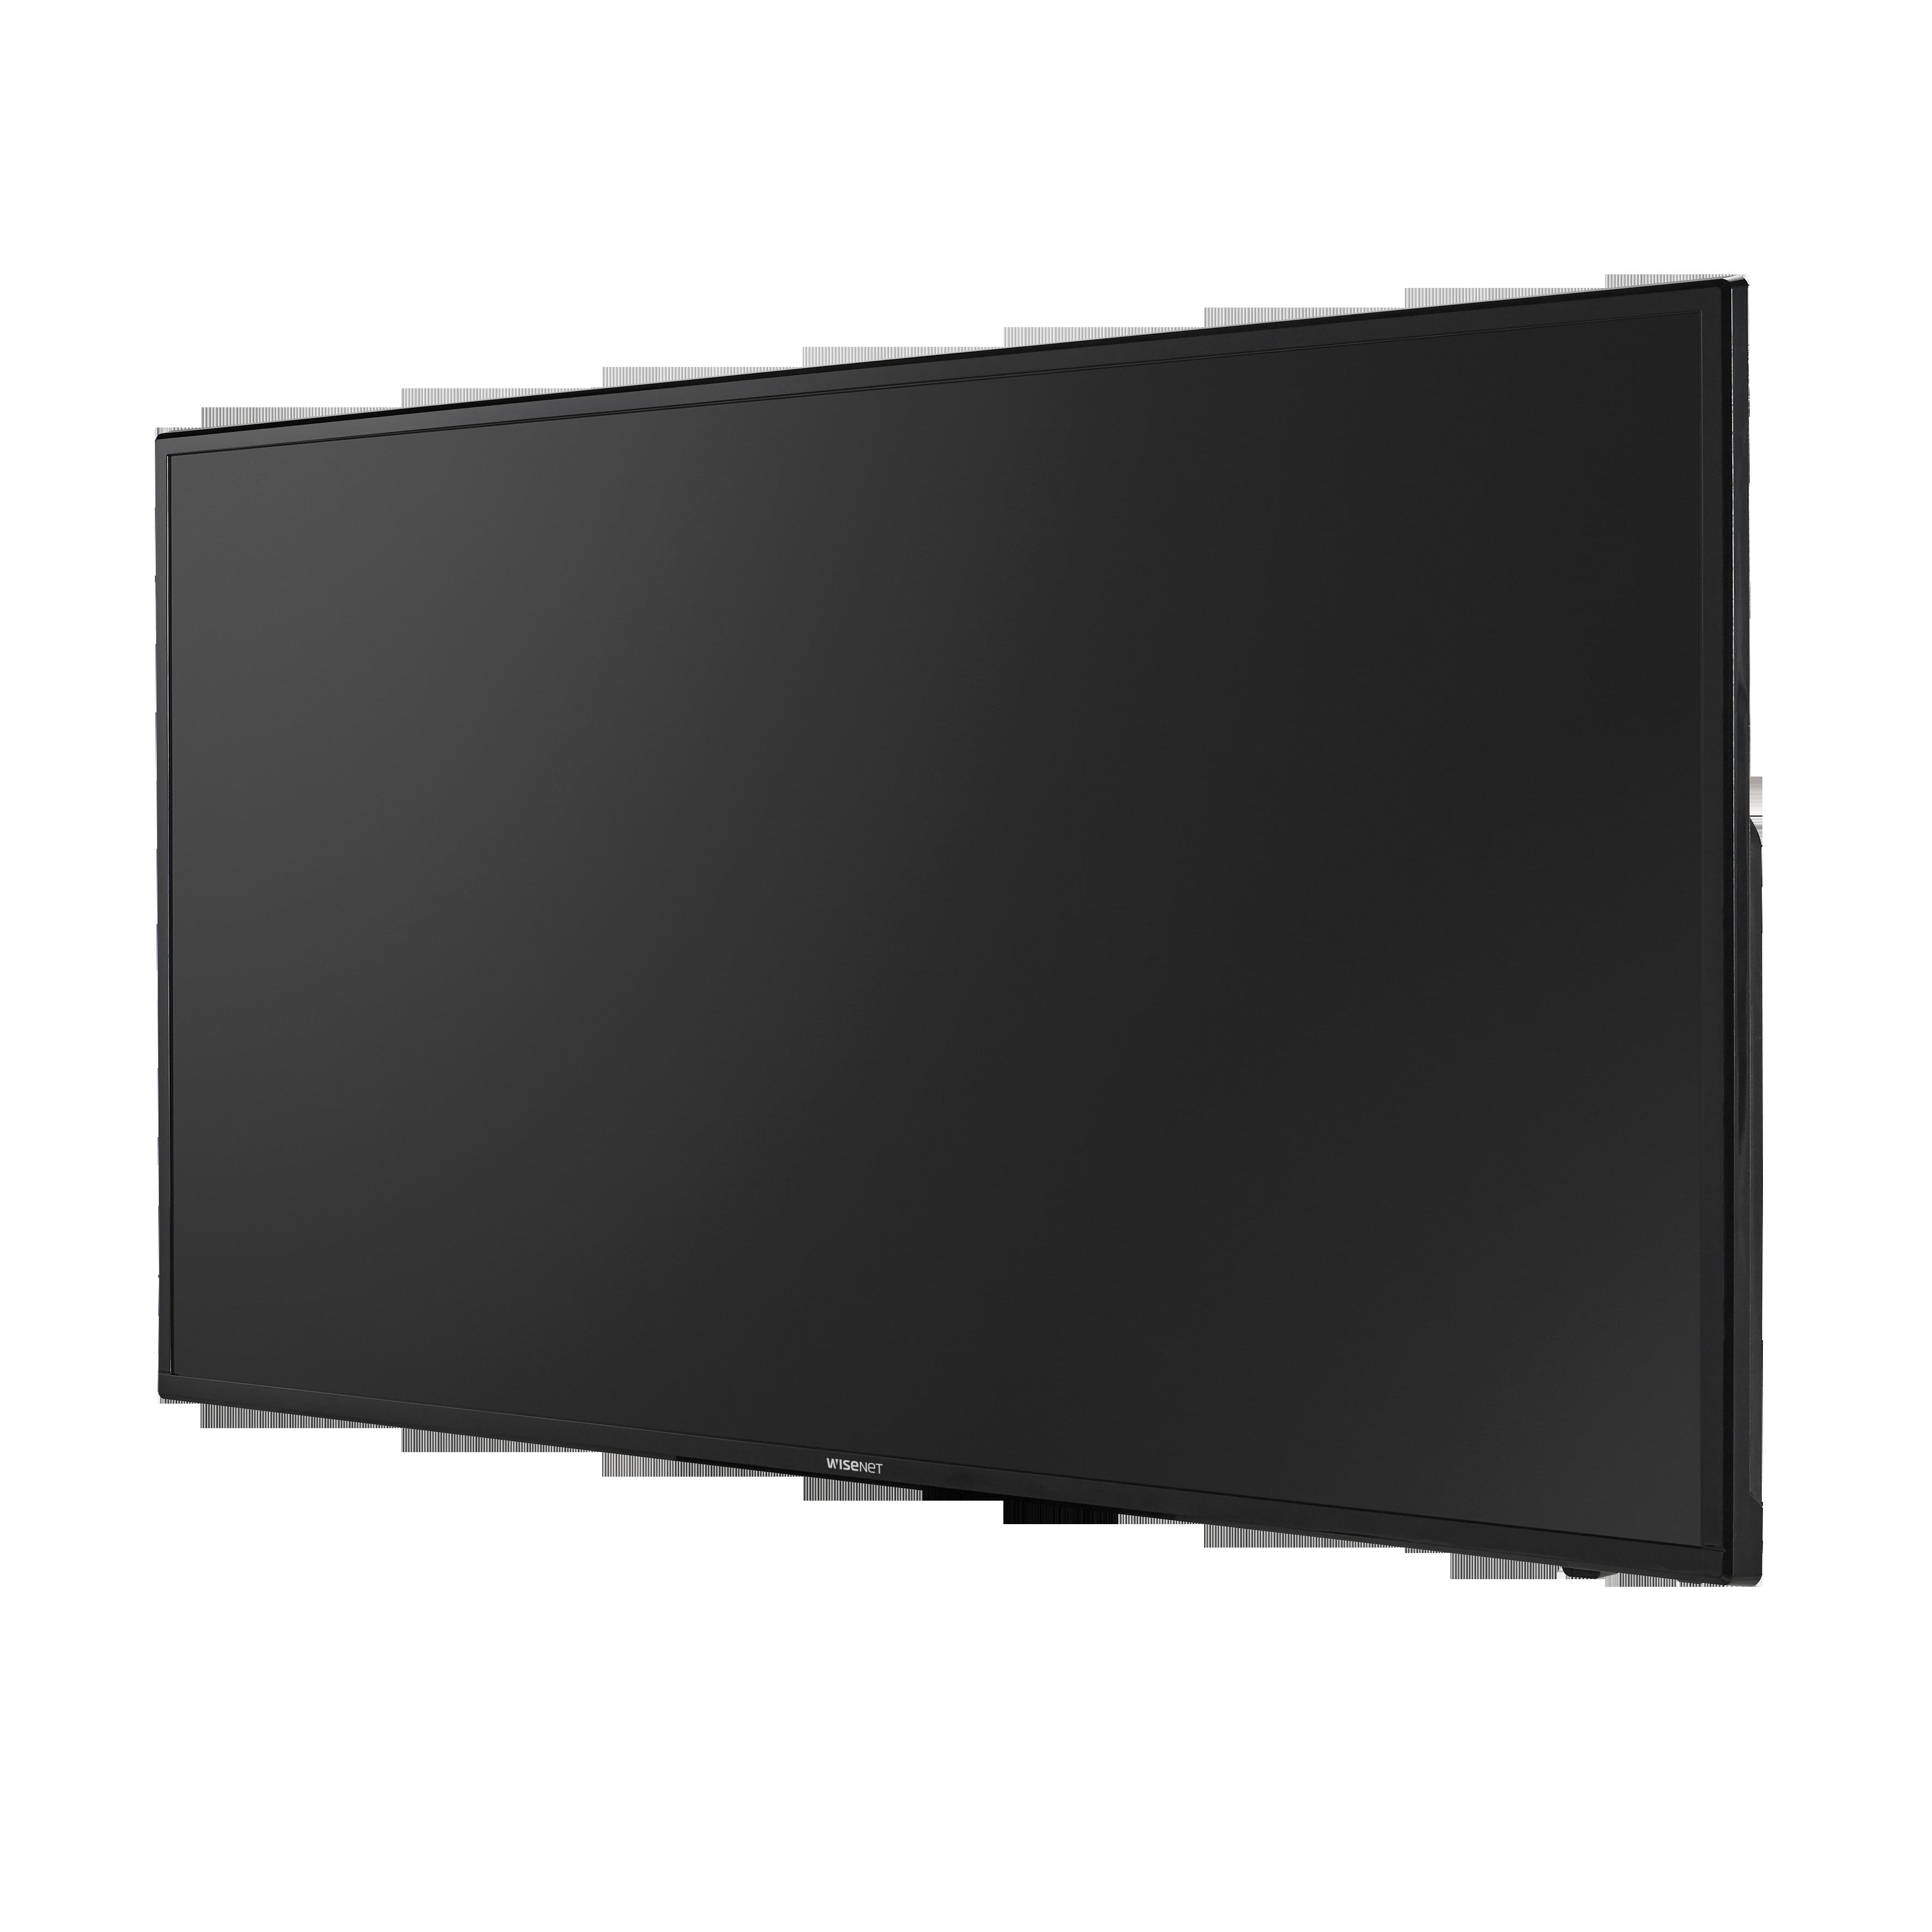 Samsung SMT 4033 FS2 En